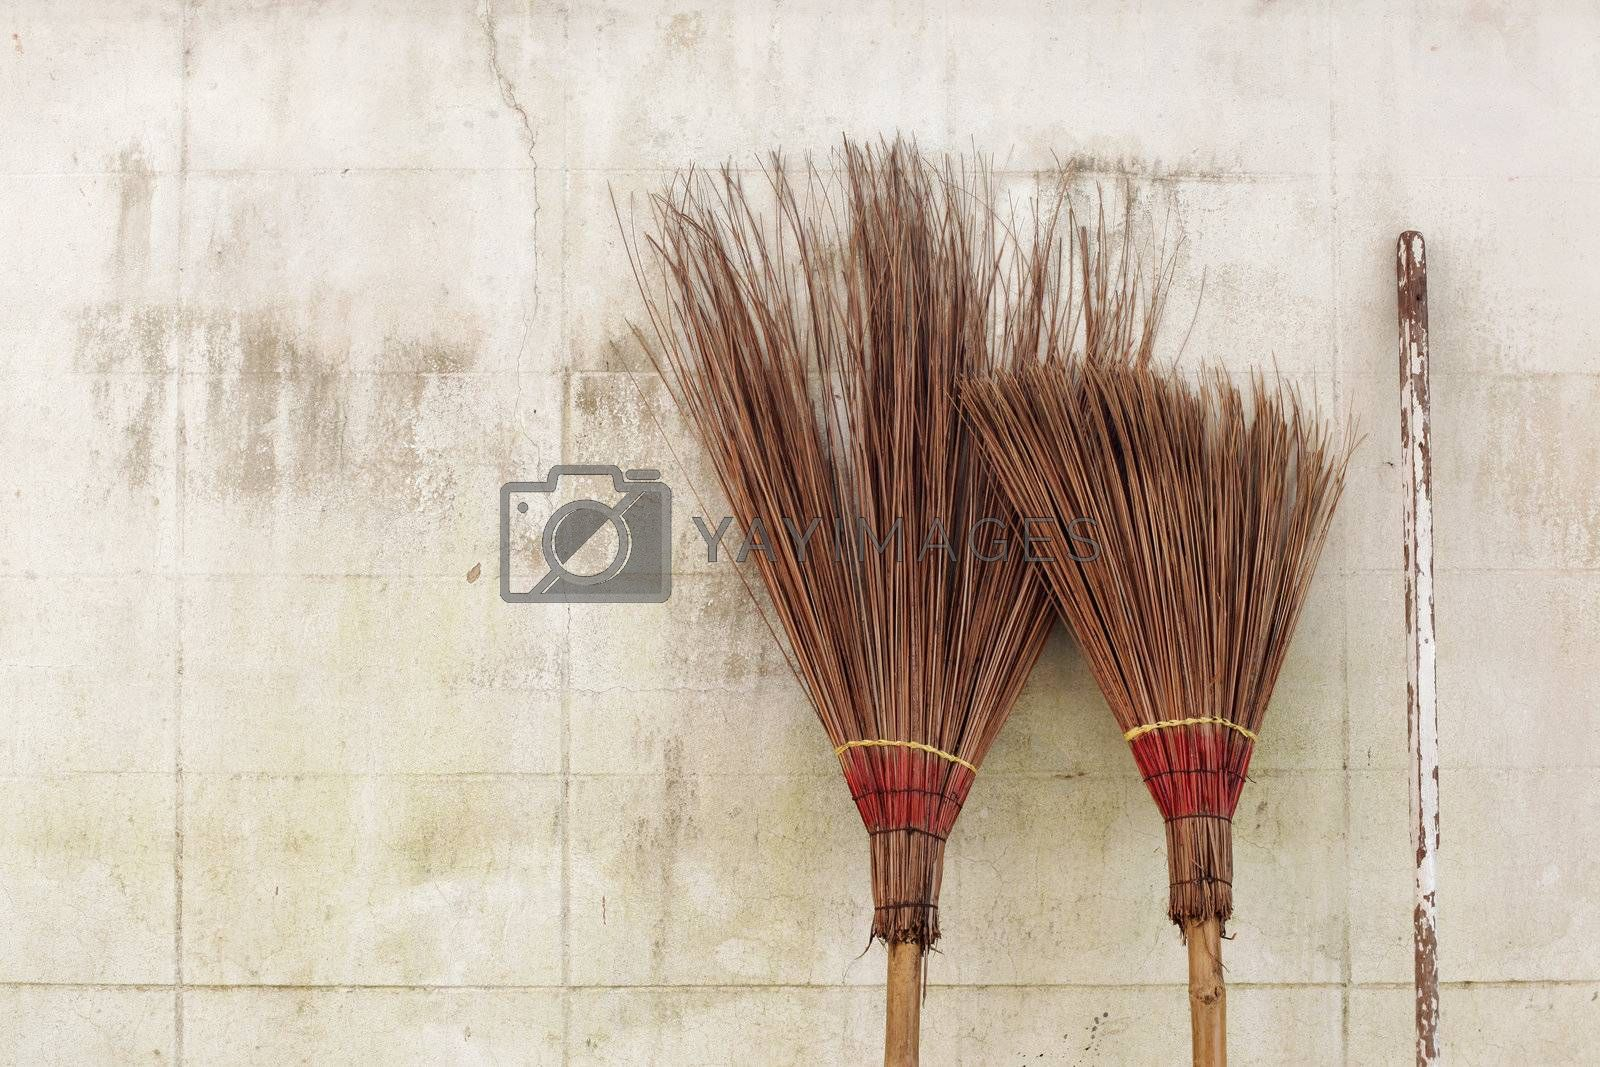 brooms by antpkr